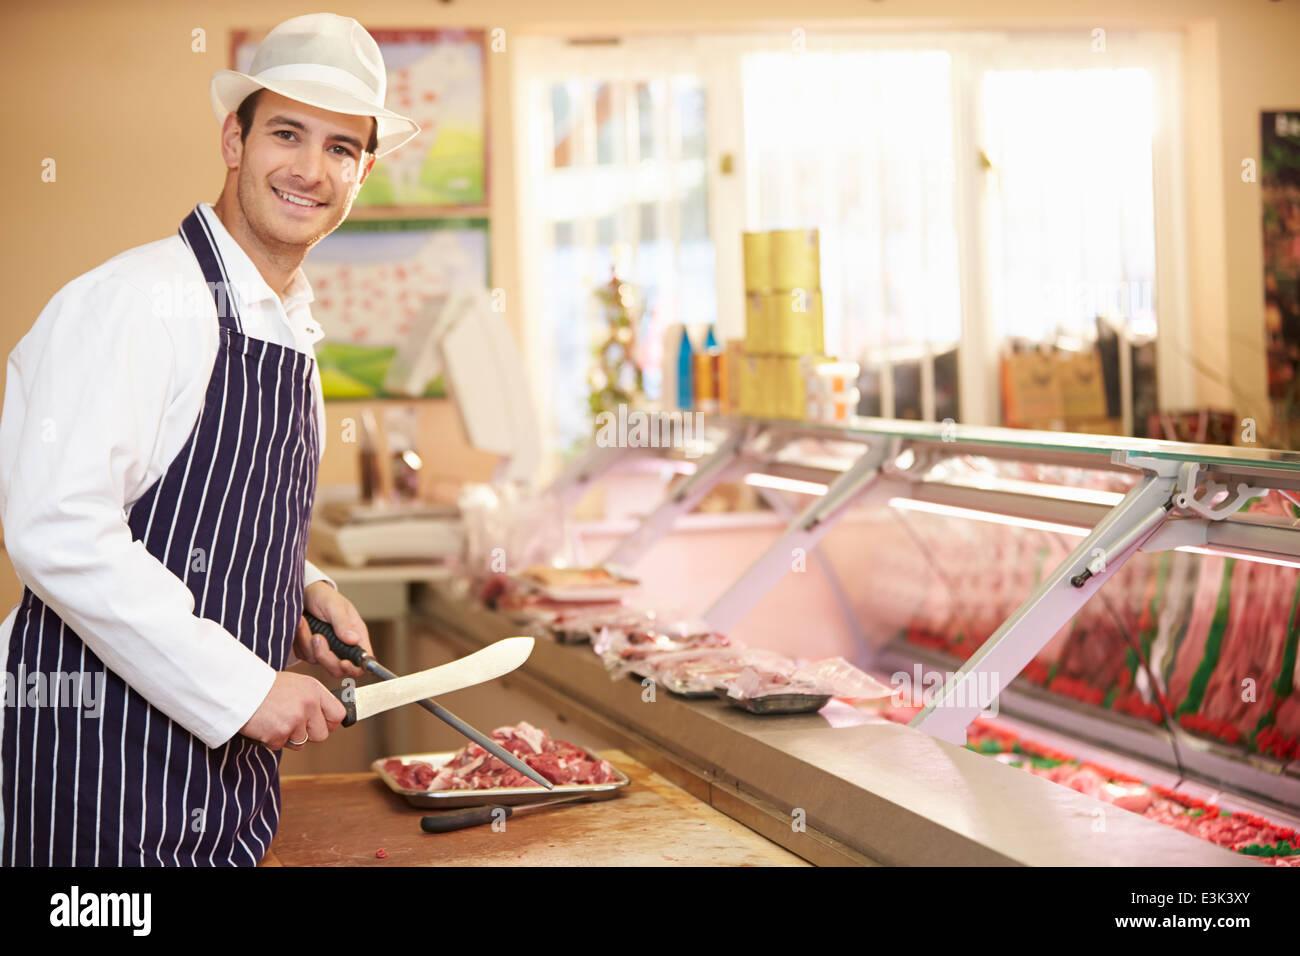 Butcher Preparing Meat In Shop - Stock Image